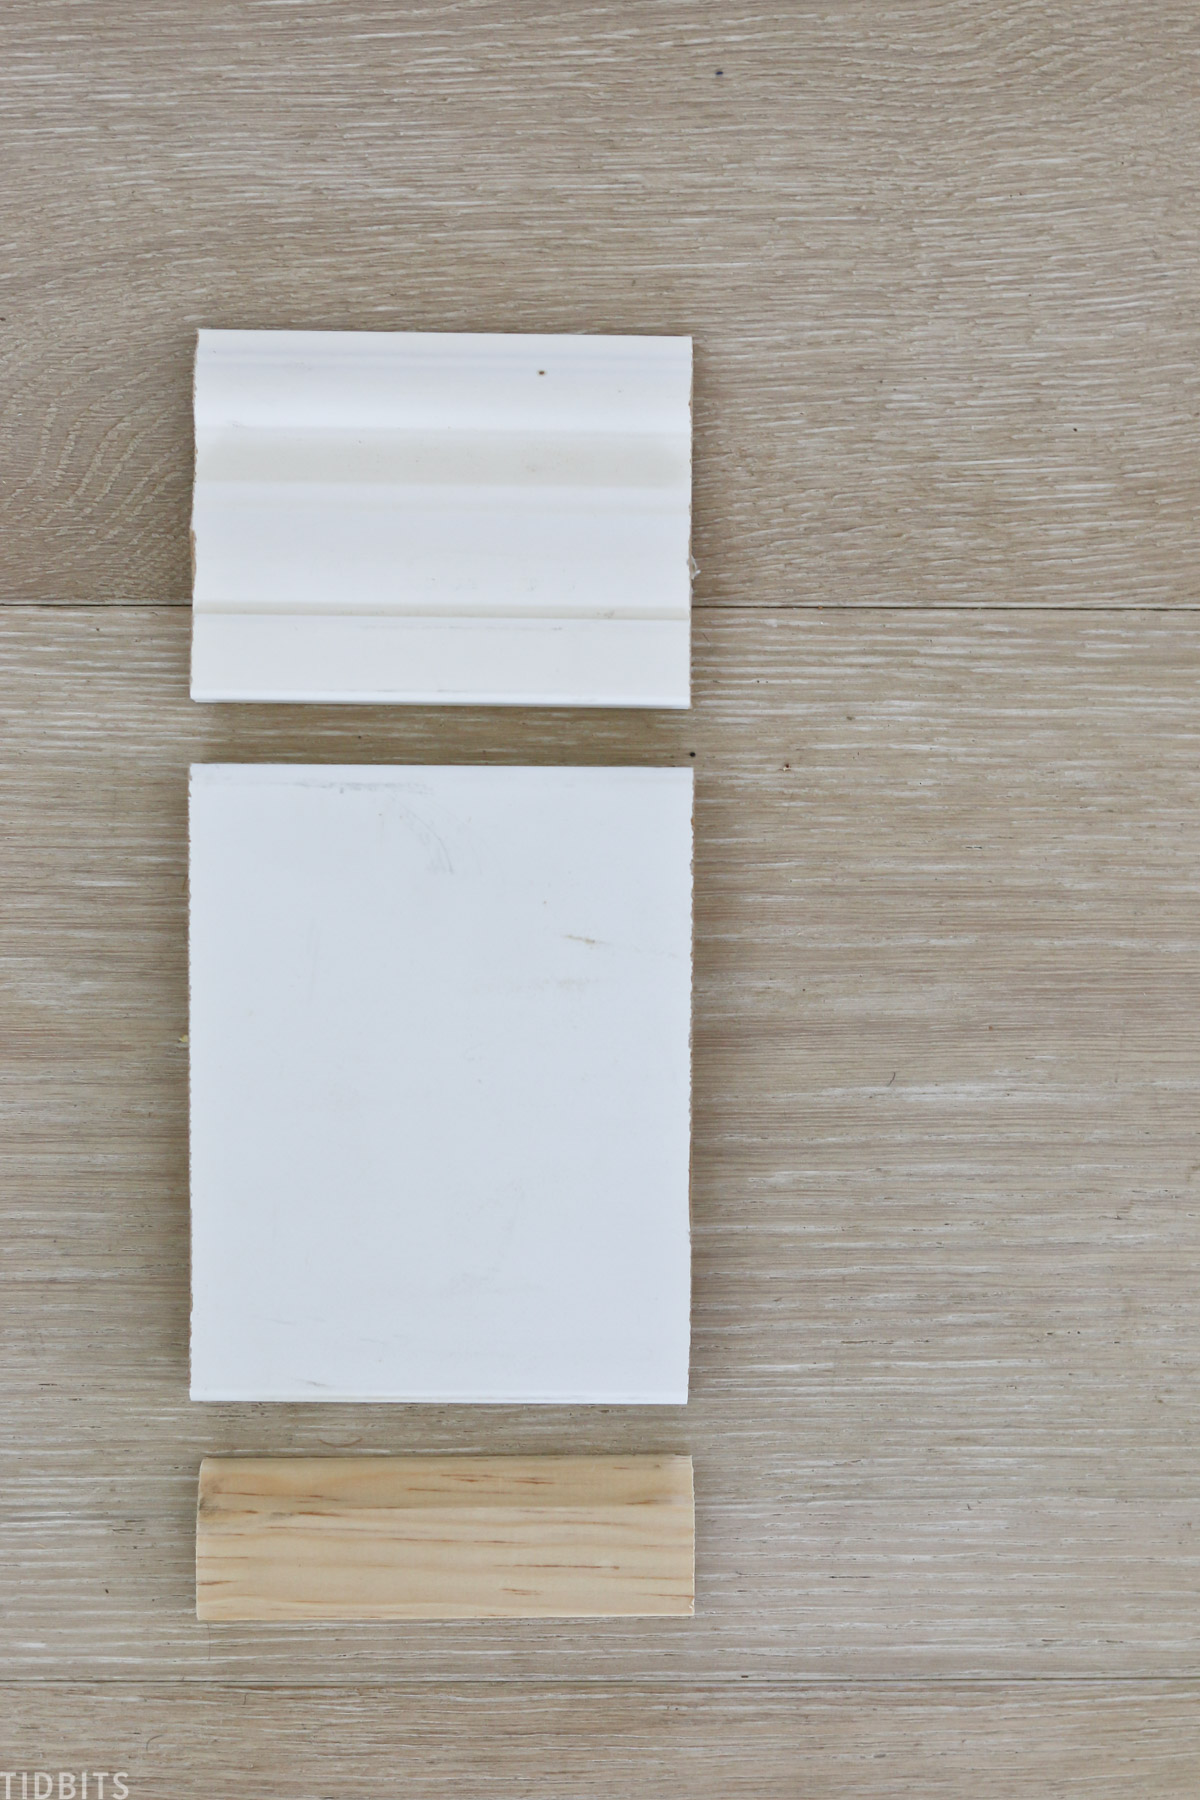 Baseboard trim pieces